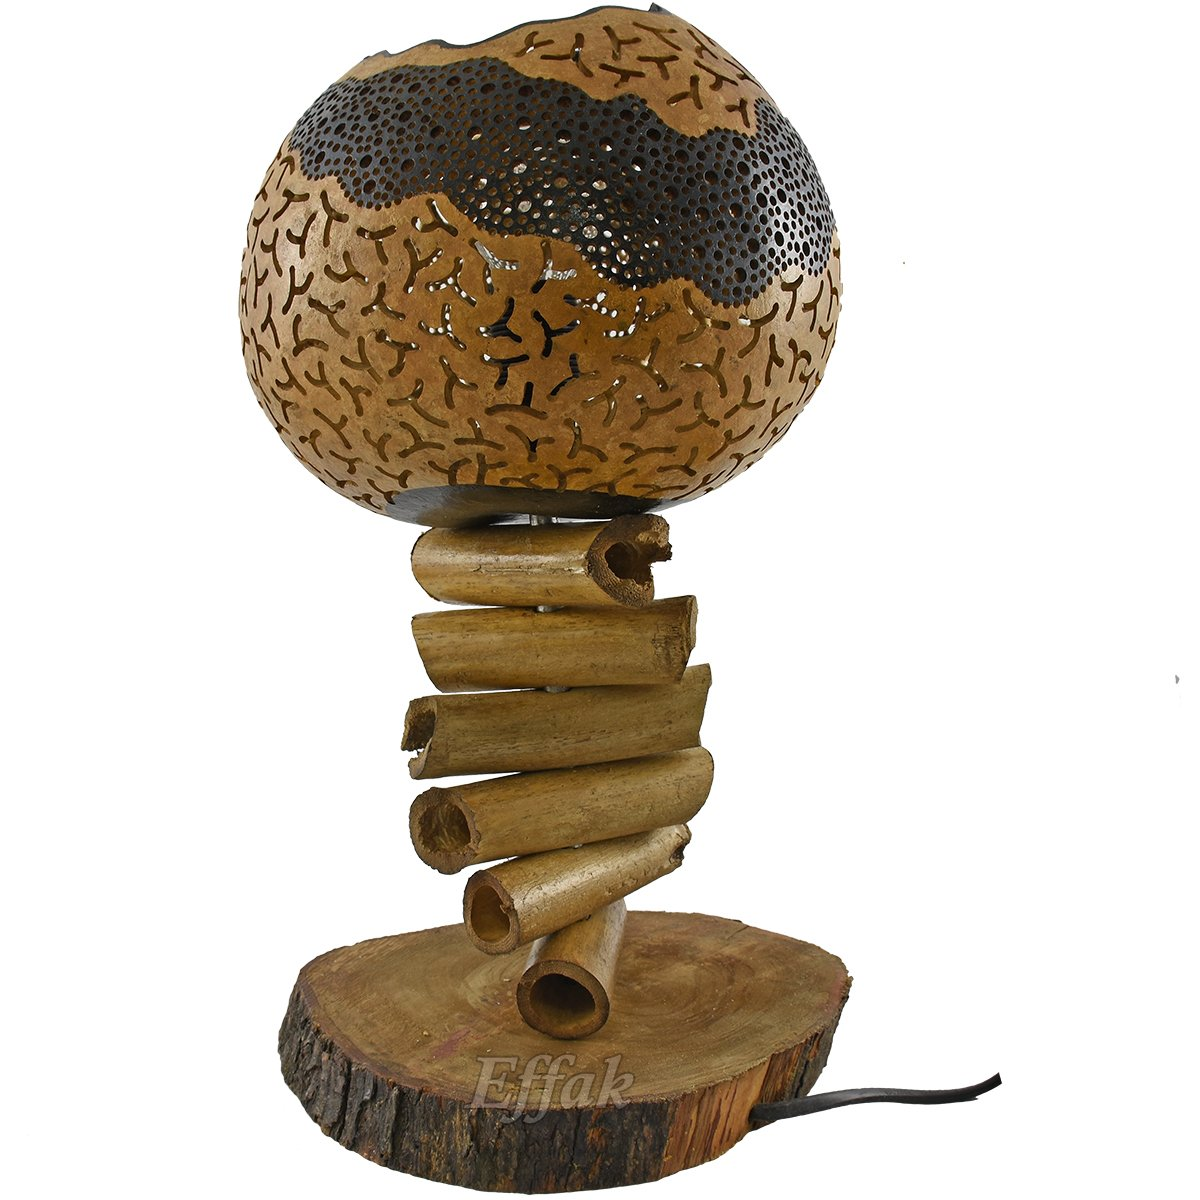 Gourd Lamps, Night Lights, Table Lamp, Desk Lamps, Turkish, Gourd Lanterns, Fairy Light, Bohemian Home Decor, Moroccan Furniture, Kürbis Lampen, Horse, Riding Club Decoration, Gift for Rider